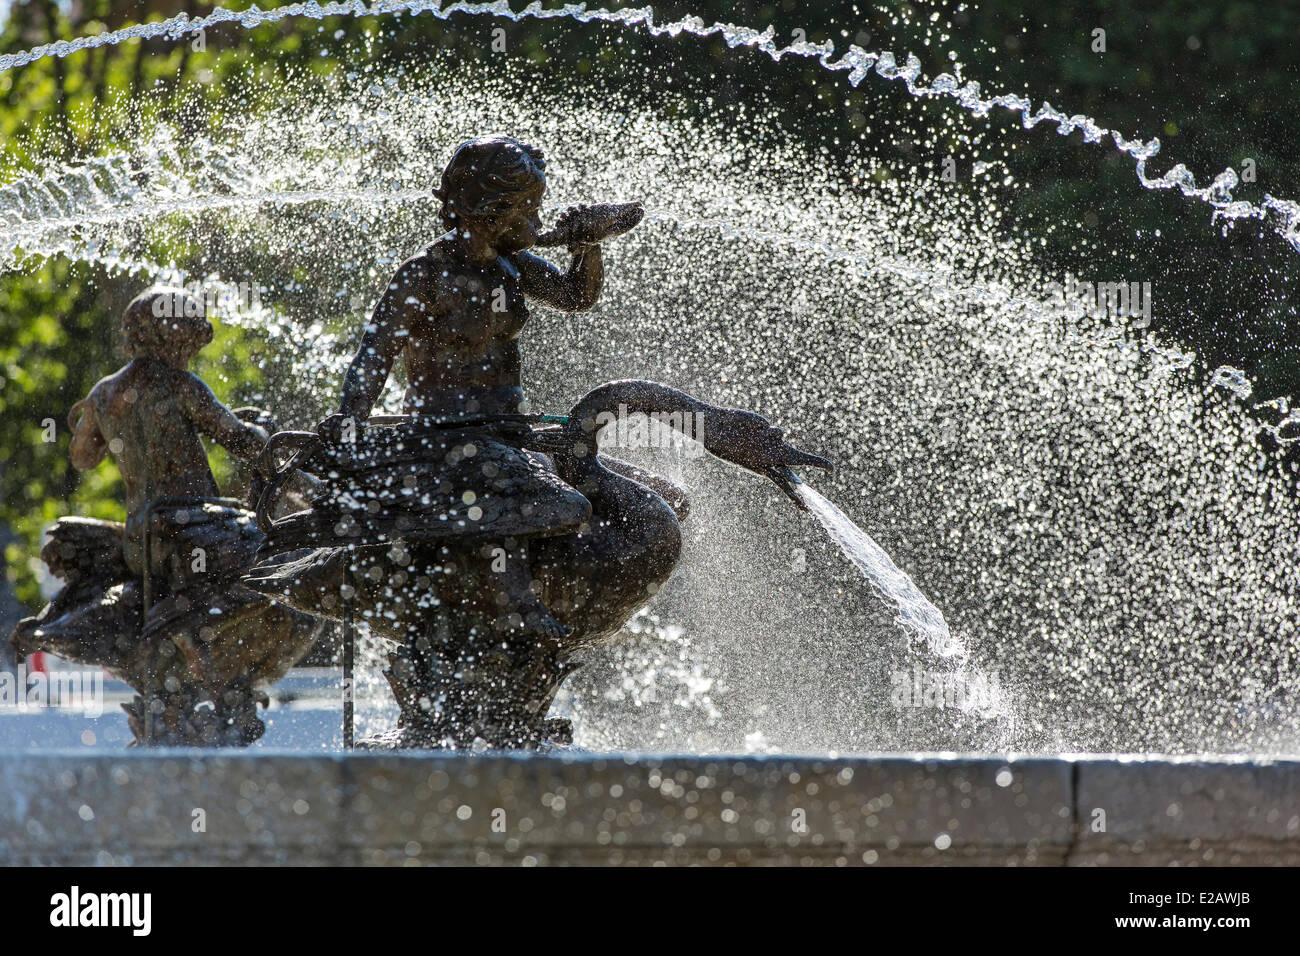 France, Bouches du Rhone, Aix en Provence, the Rotonde fountain - Stock Image